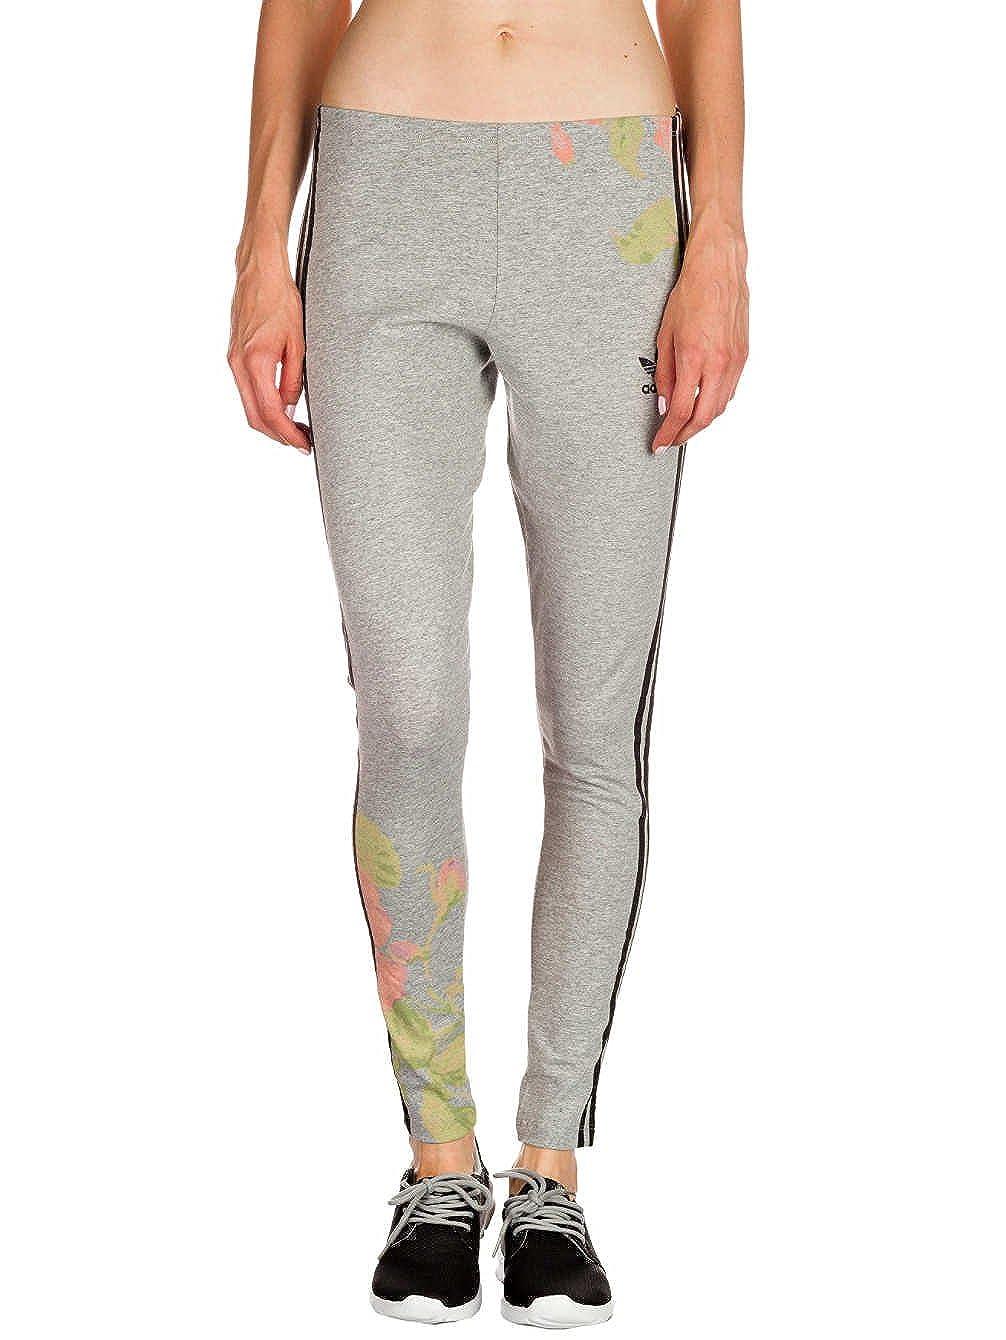 Pants Women adidas Originals Pastel Rose Leggings: Amazon.co